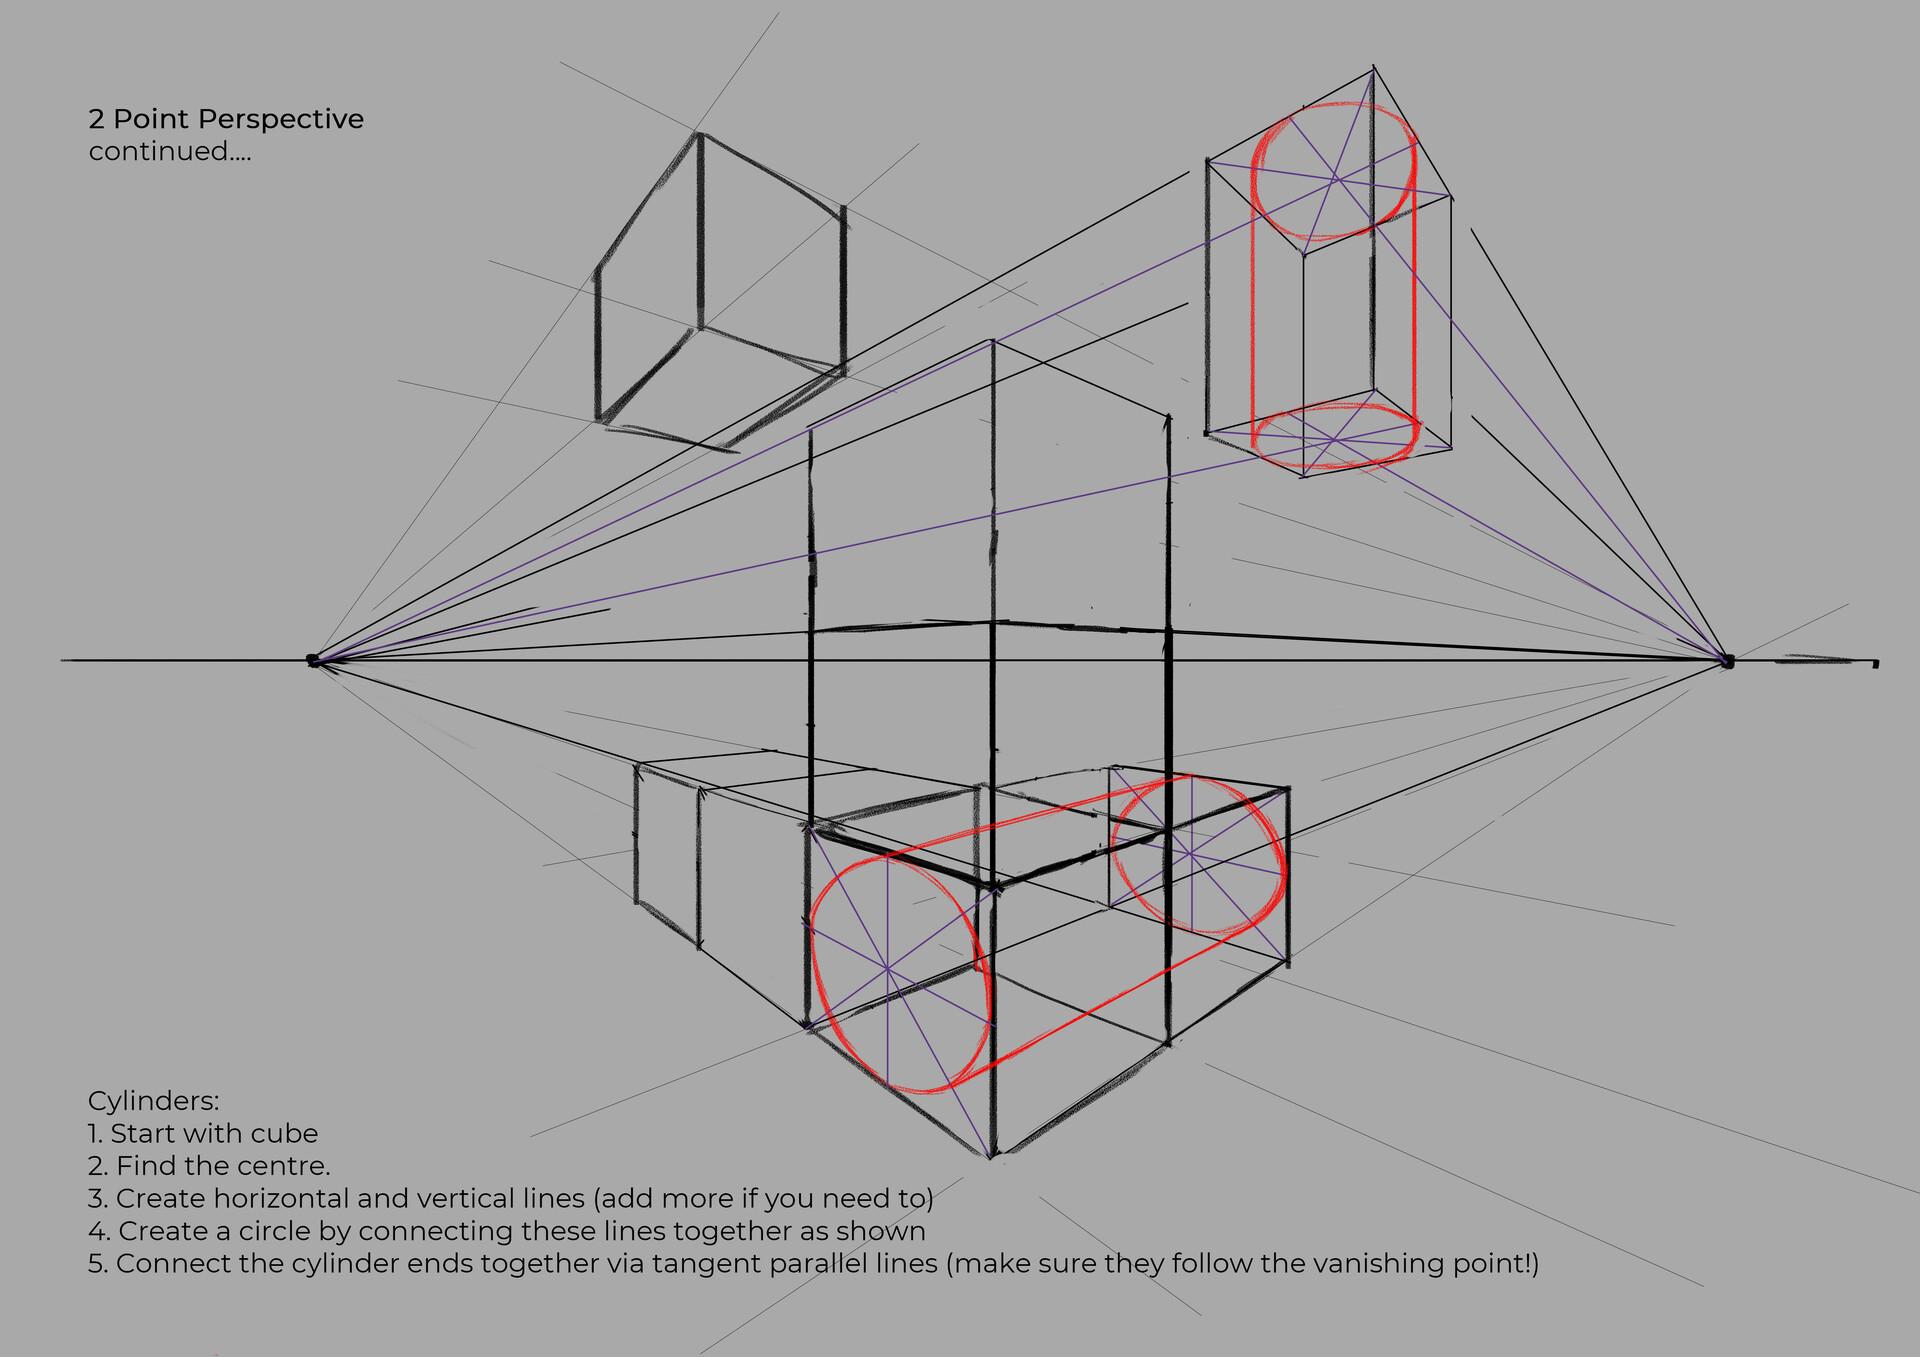 Shellz art perspective 5